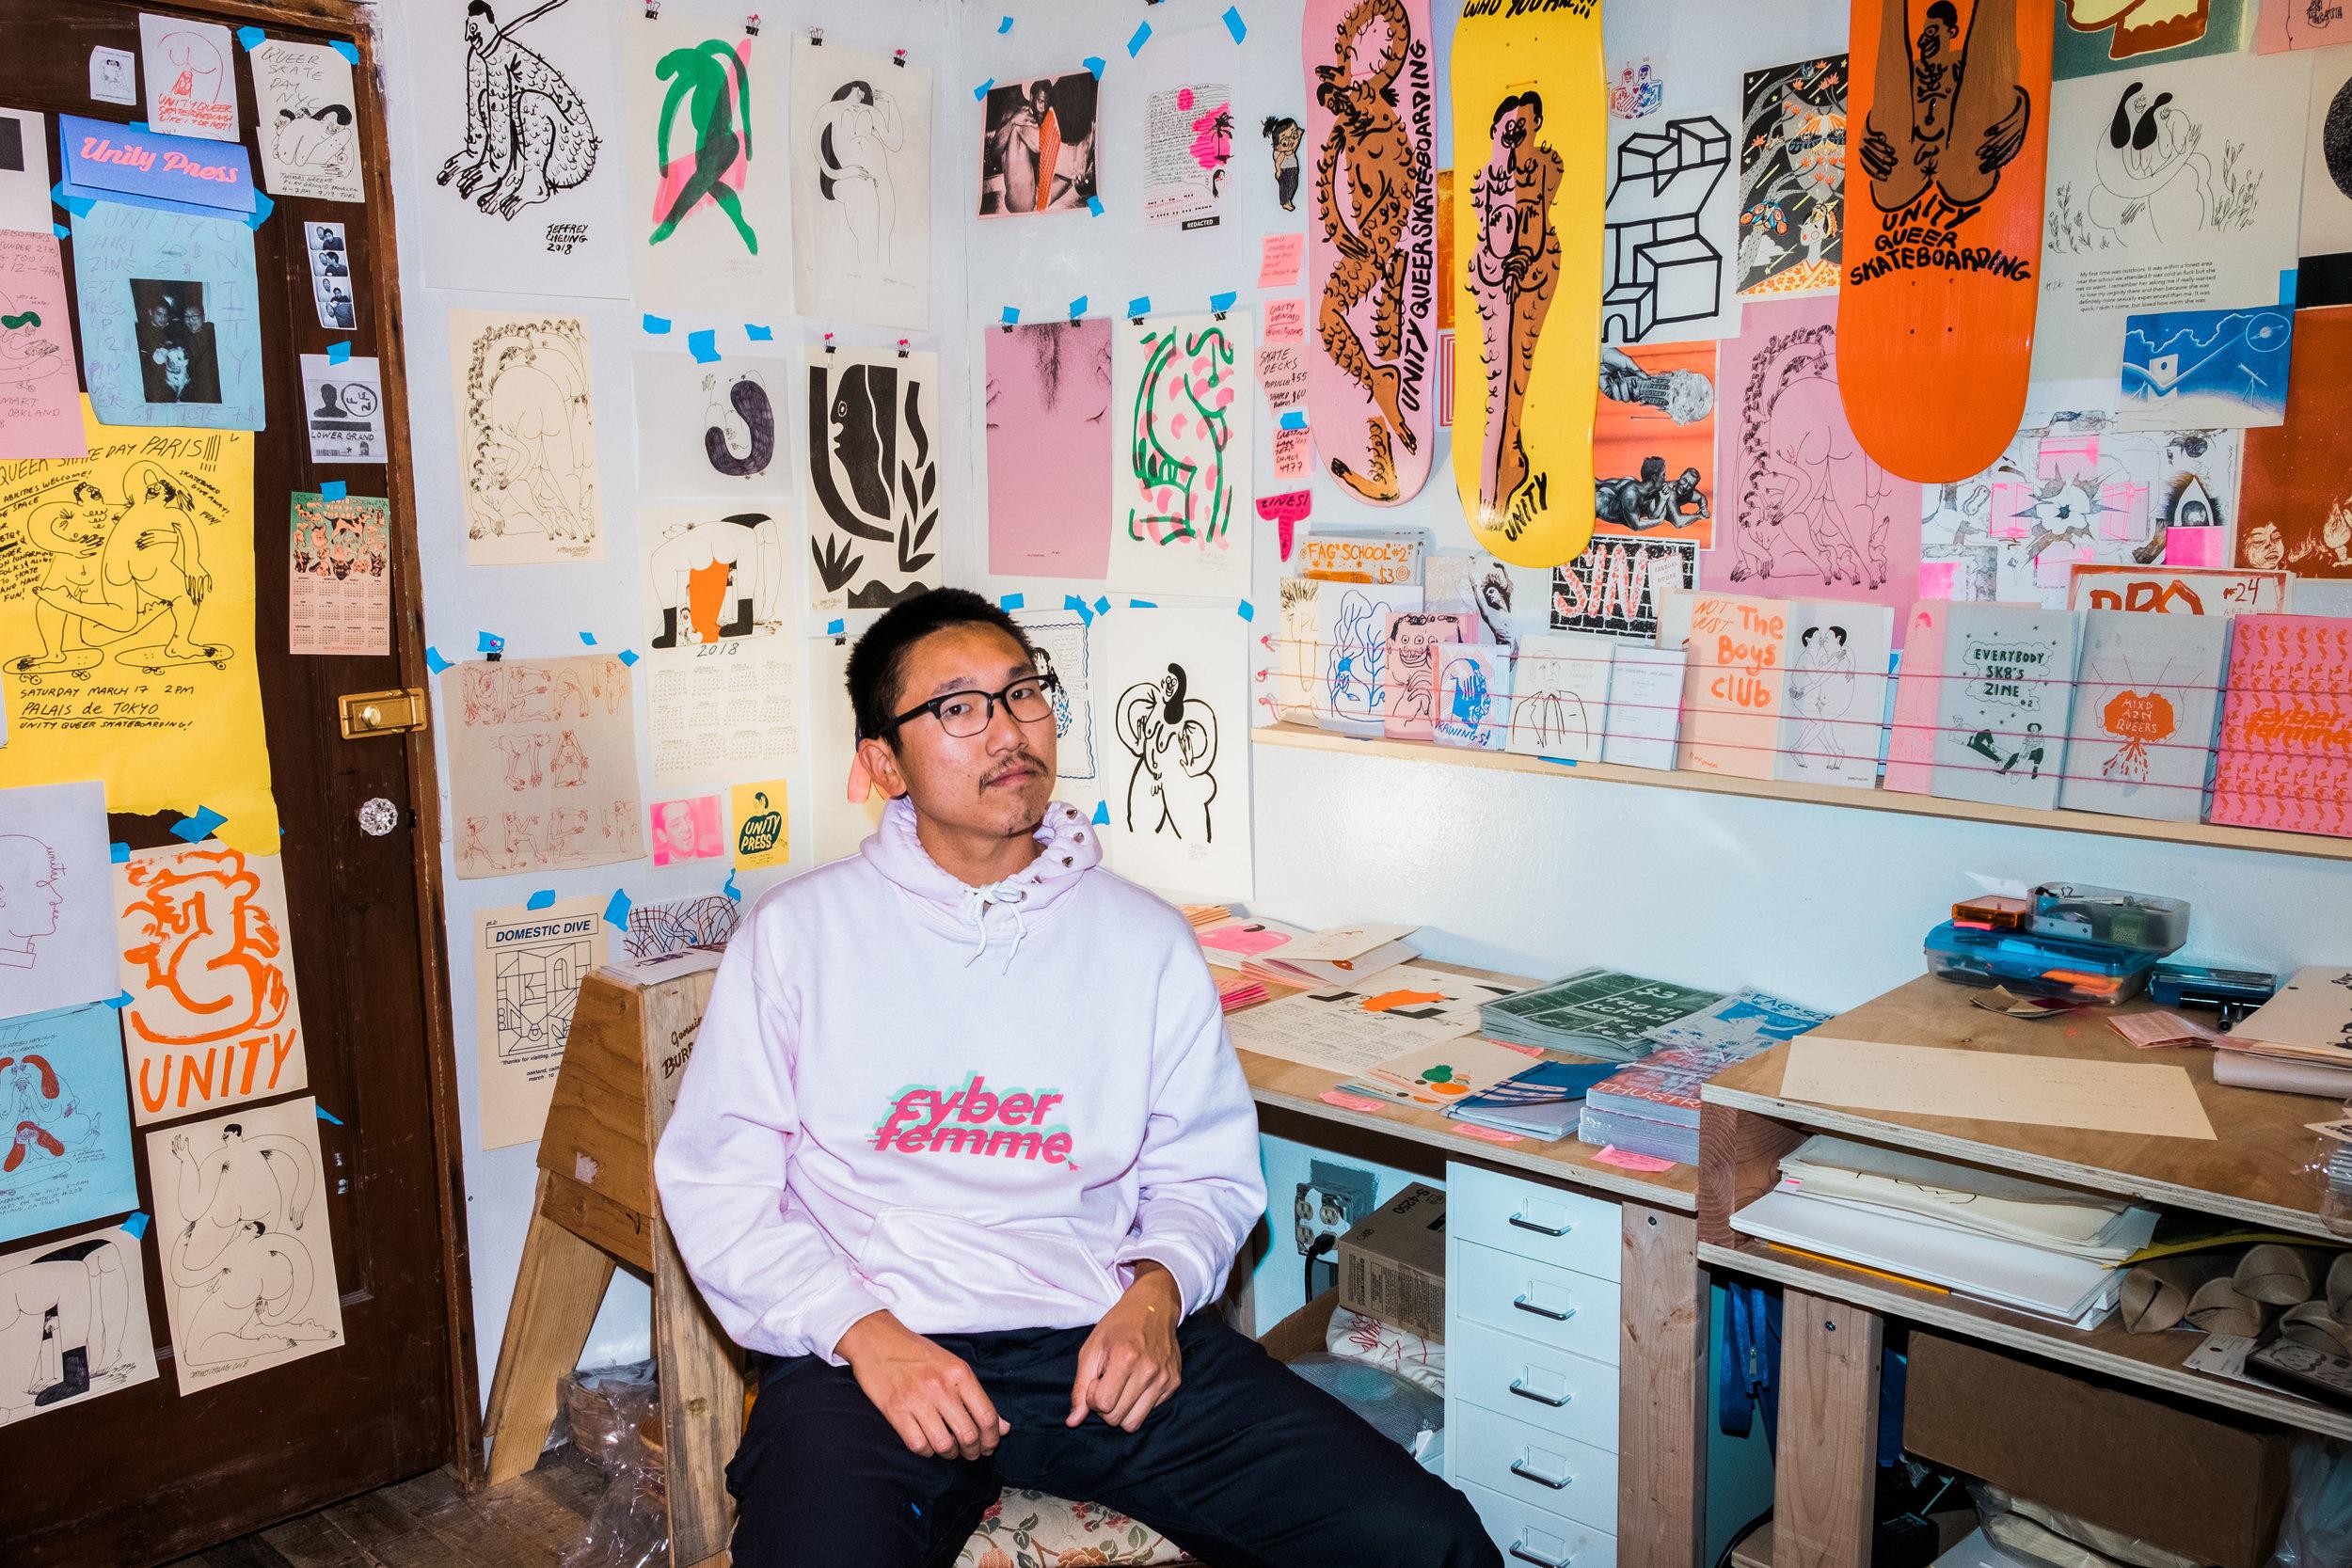 Jeffrey Cheung